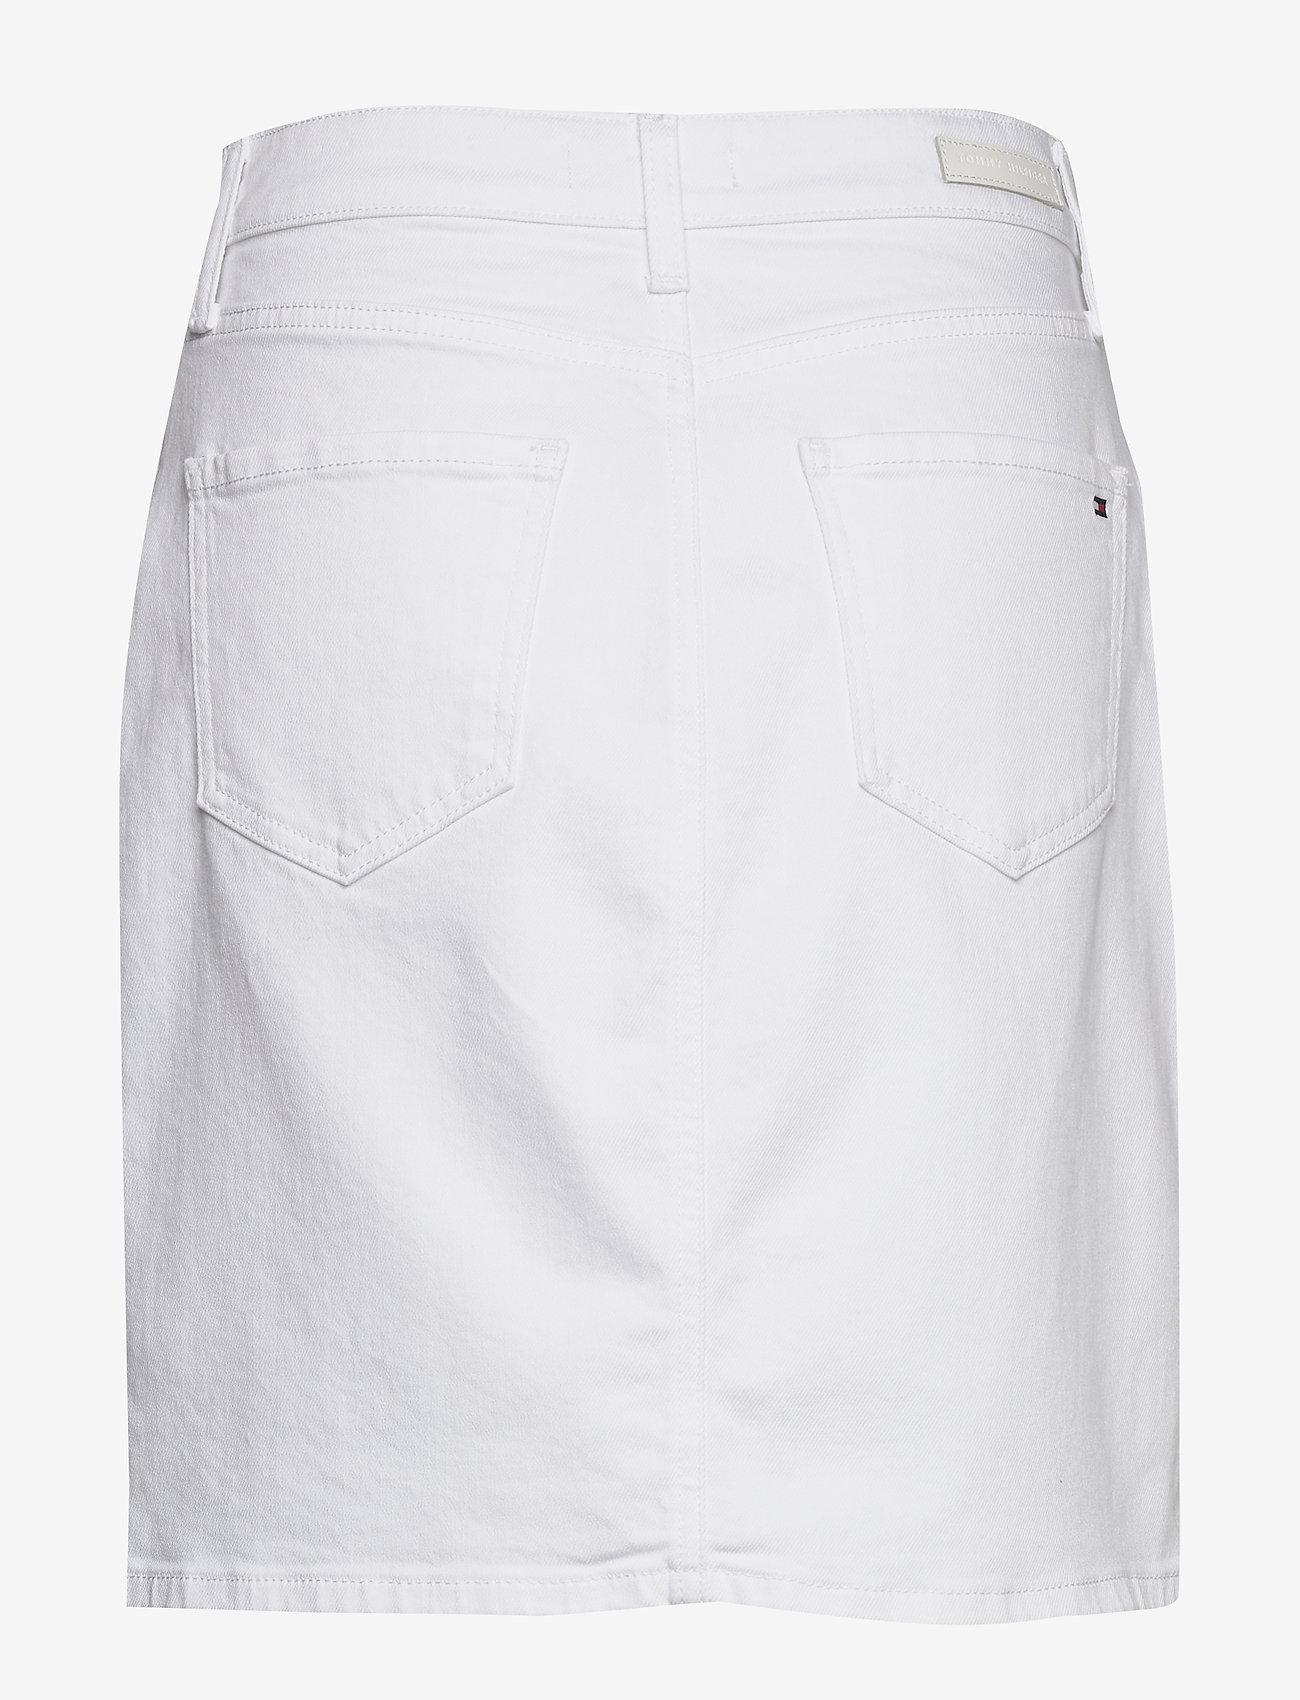 Tommy Hilfiger - ROME STRAIGHT HW SKI - jupes en jeans - white - 1